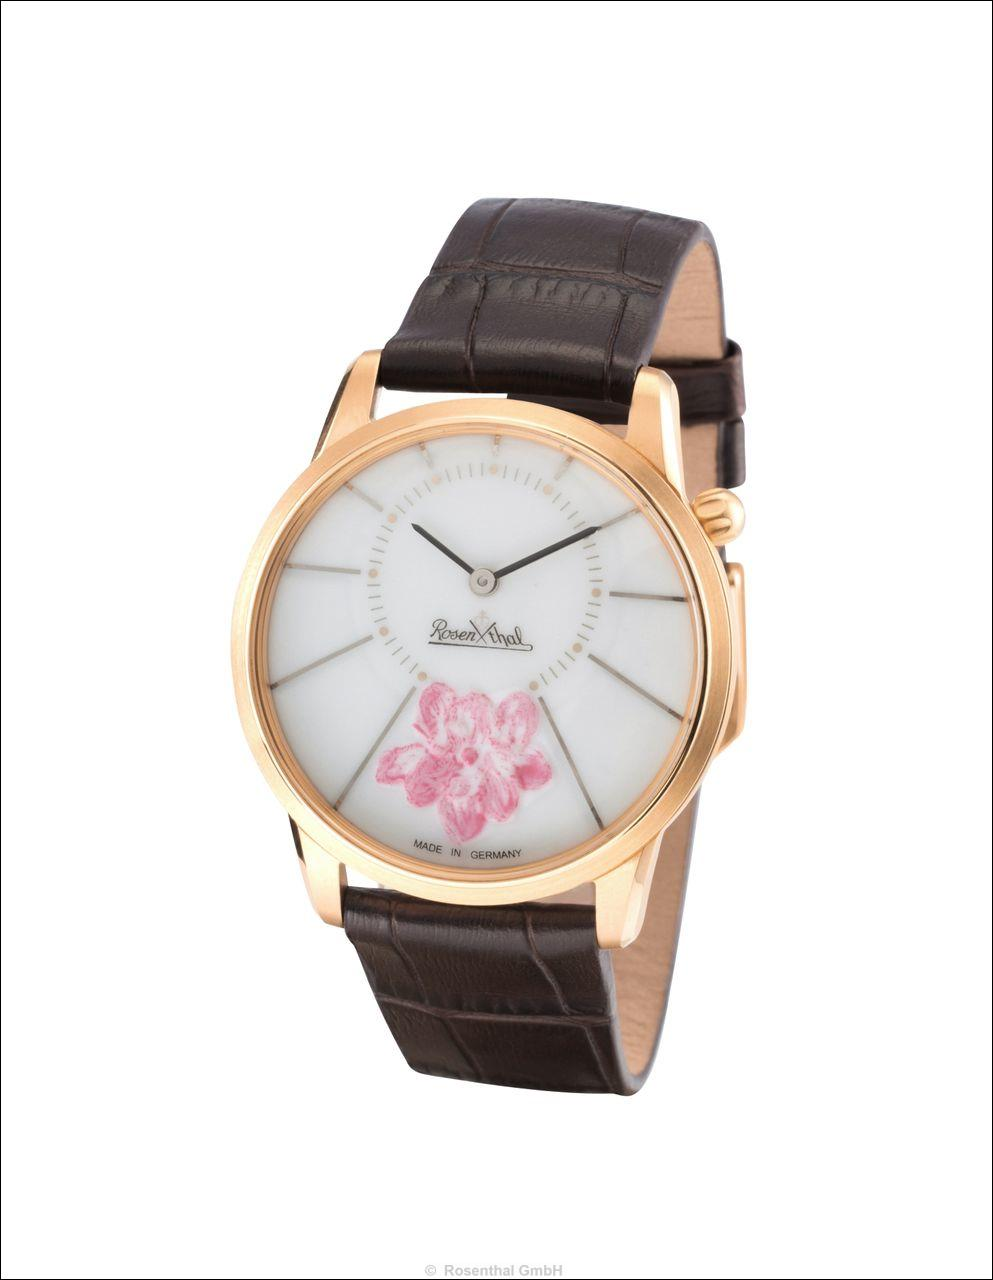 "Stylische Armbanduhren: ""Cherry Blossom"""